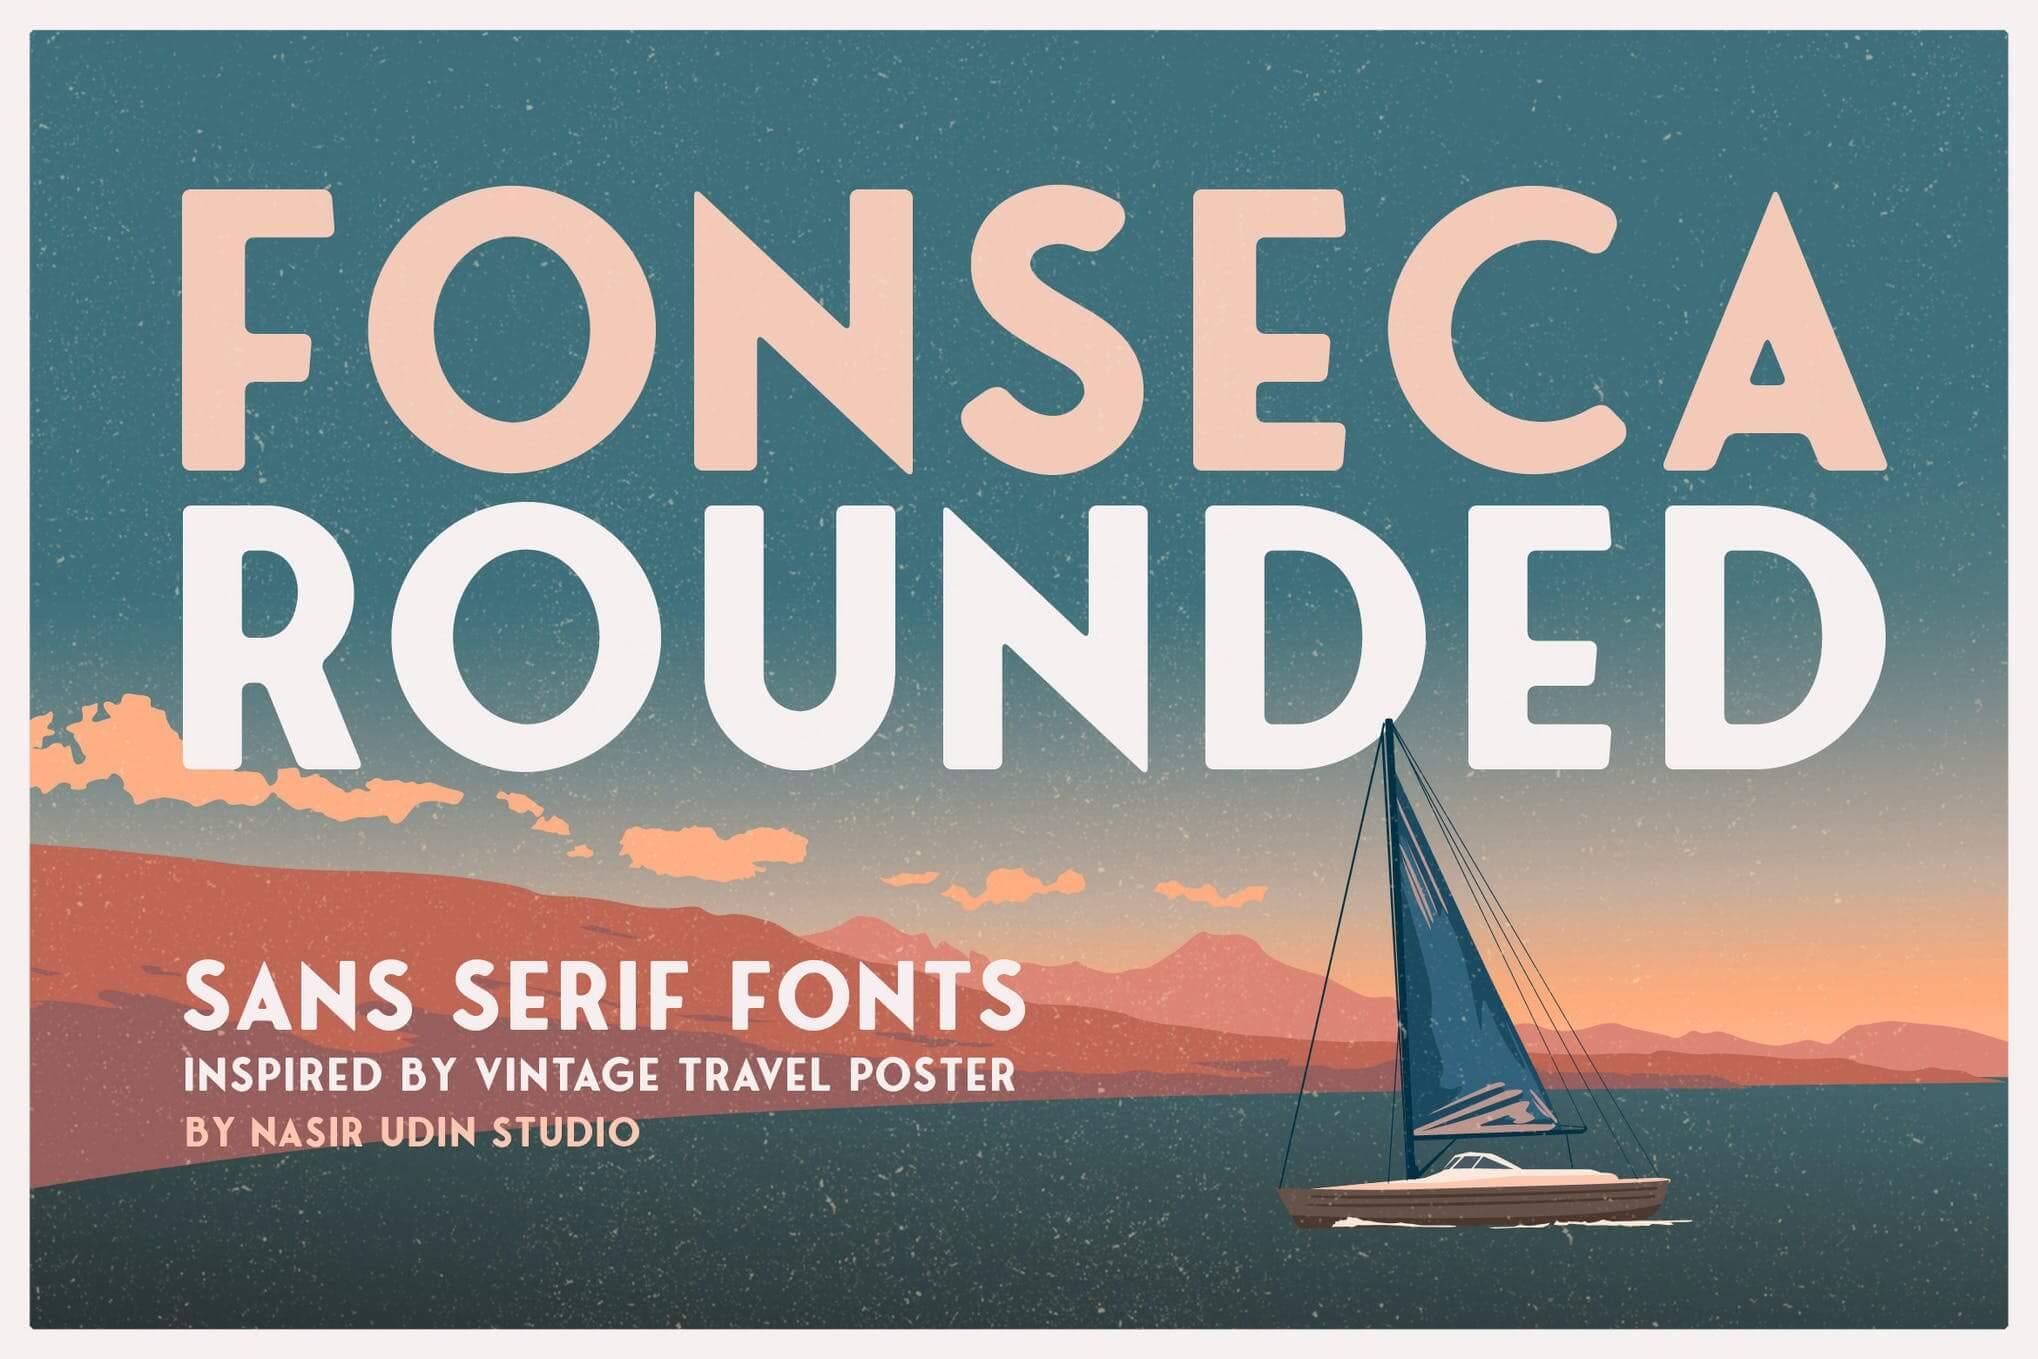 sans serif fonts fonseca rounded - UI Freebies